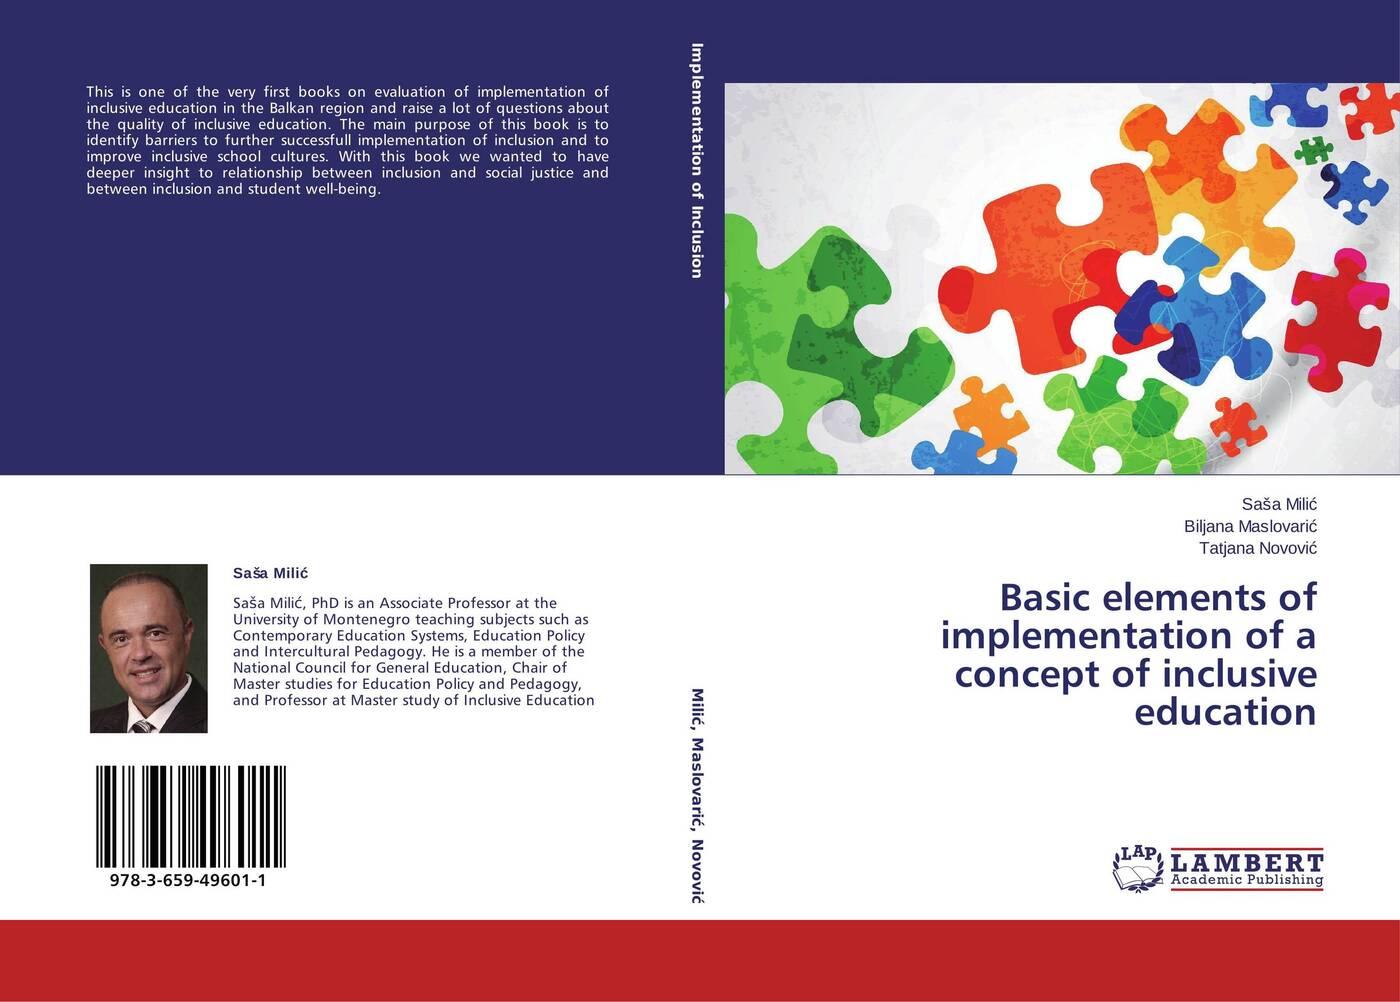 Saša Milić,Biljana Maslovarić and Tatjana Novović Basic elements of implementation of a concept of inclusive education joseph lelan inclusive education in kenya